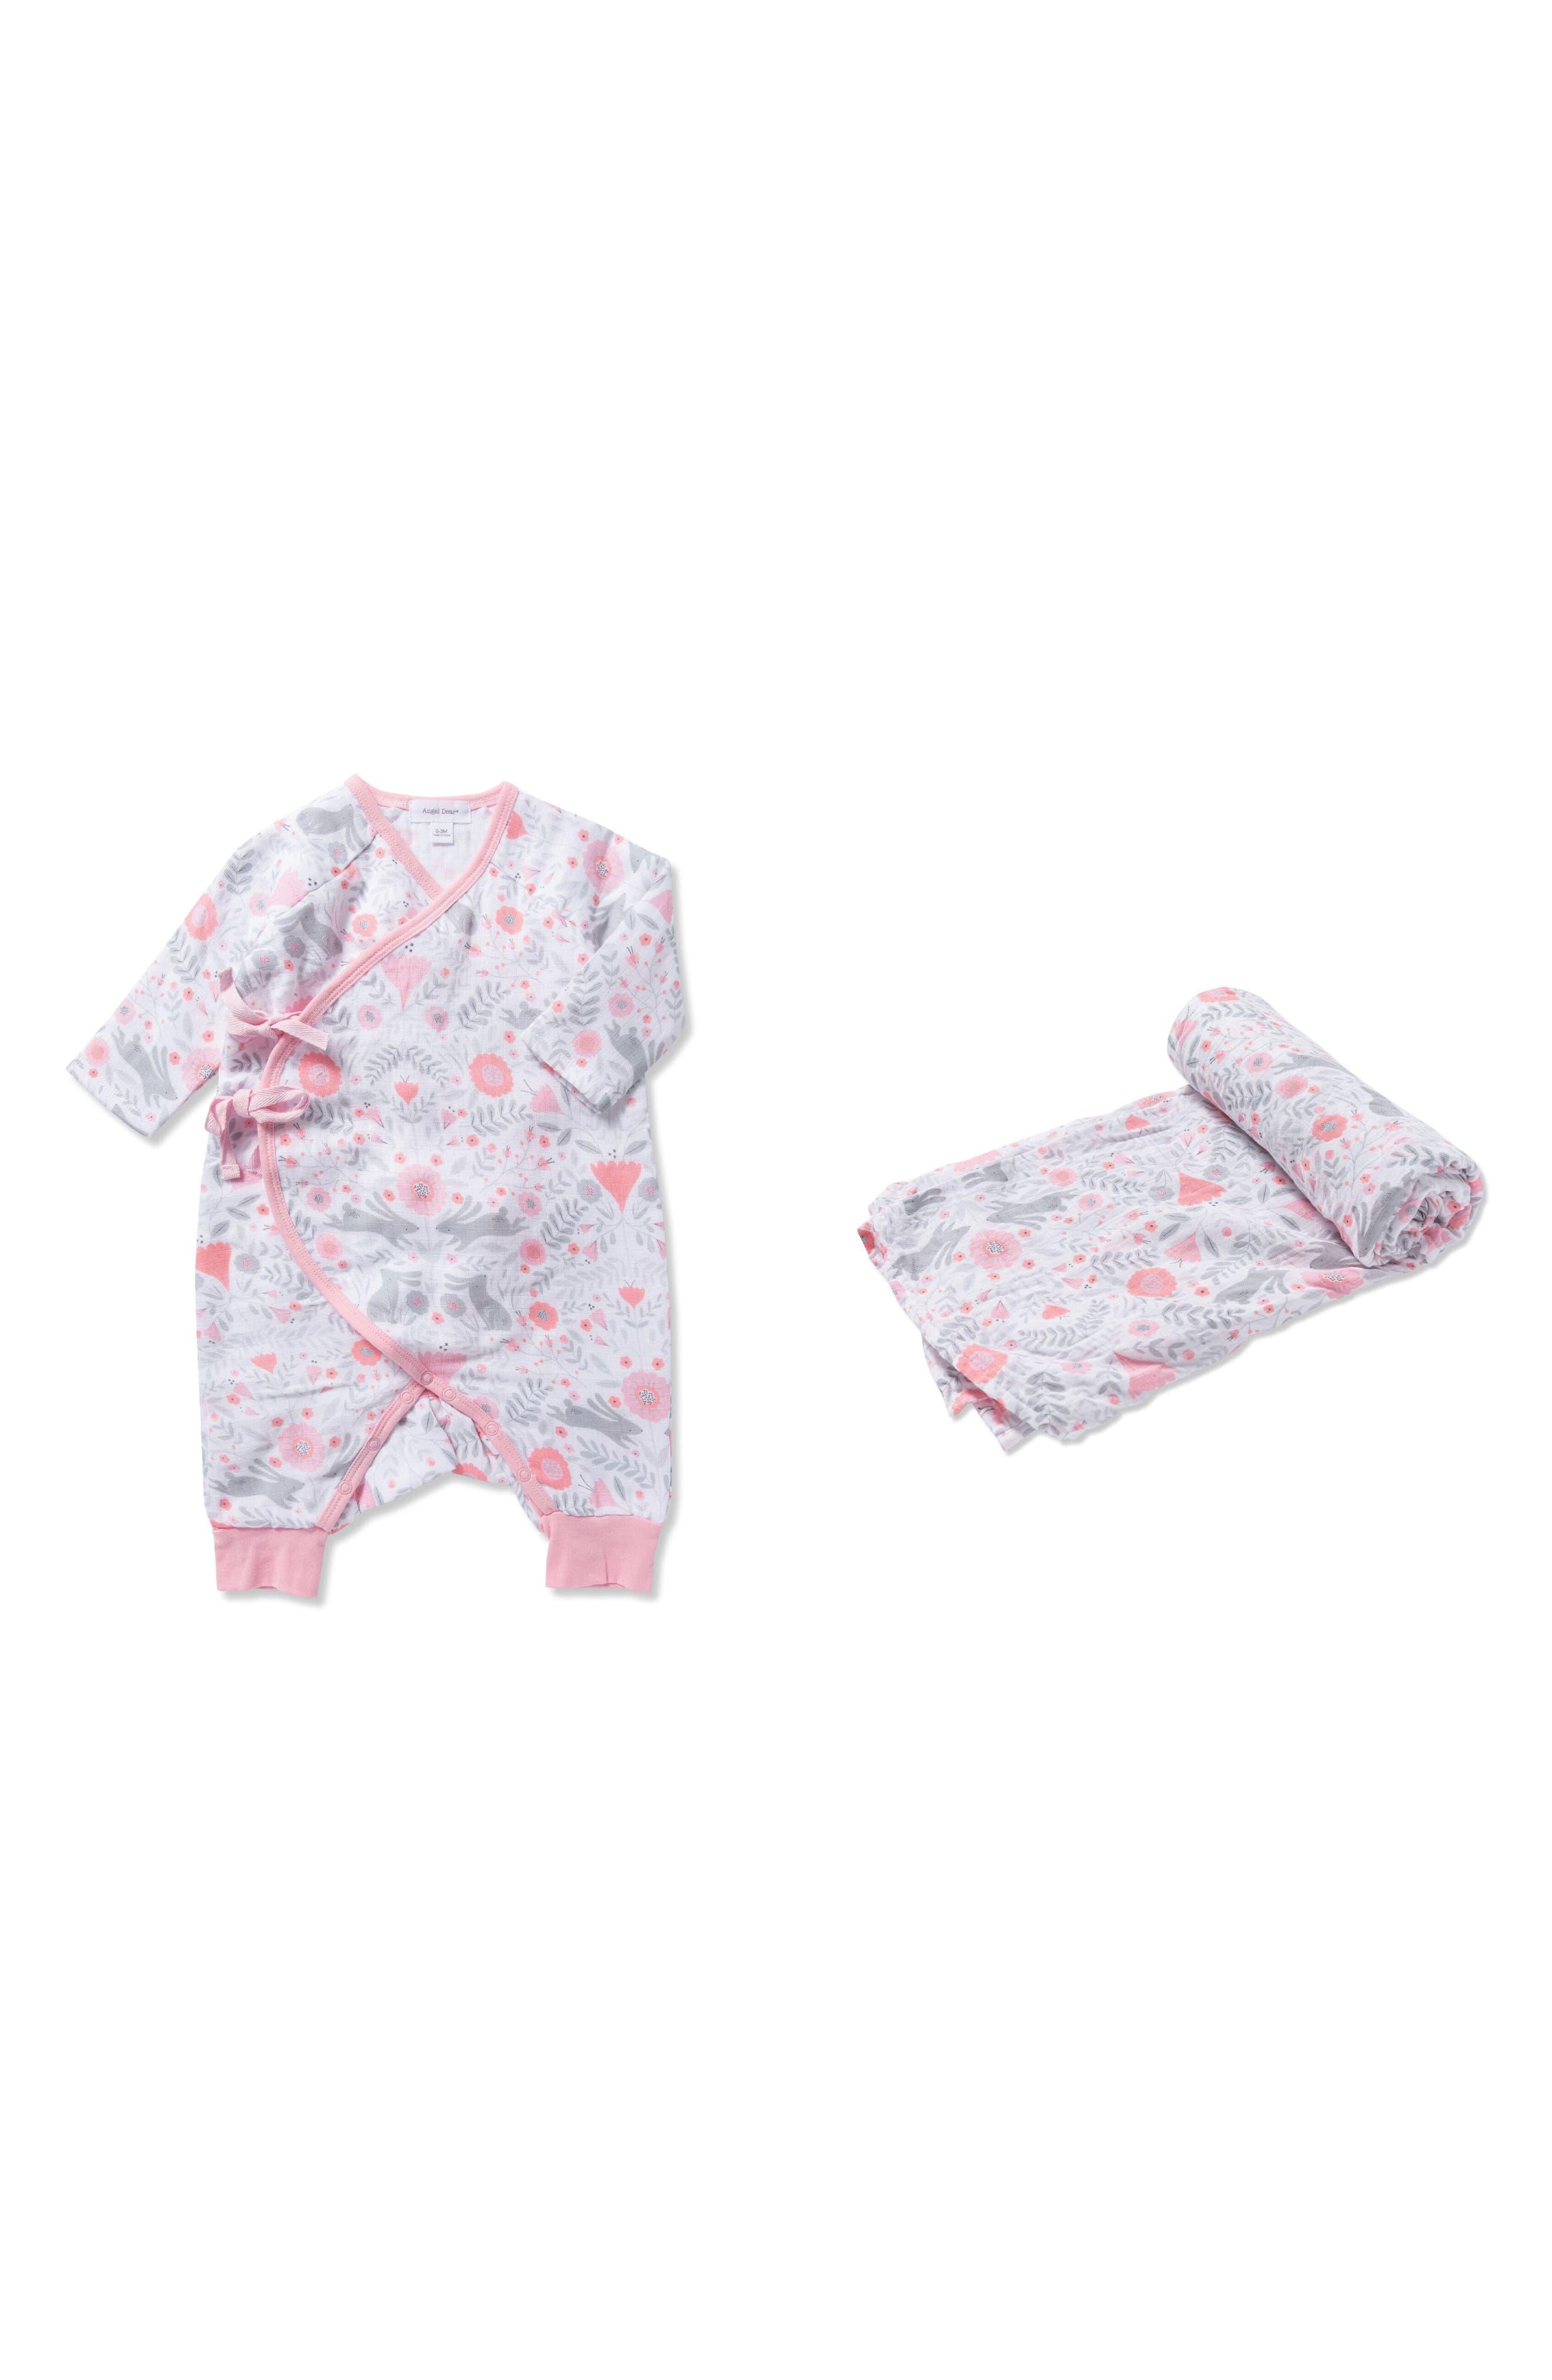 Bunny Print Romper & Swaddling Blanket Set,                             Main thumbnail 1, color,                             Pink/ Grey